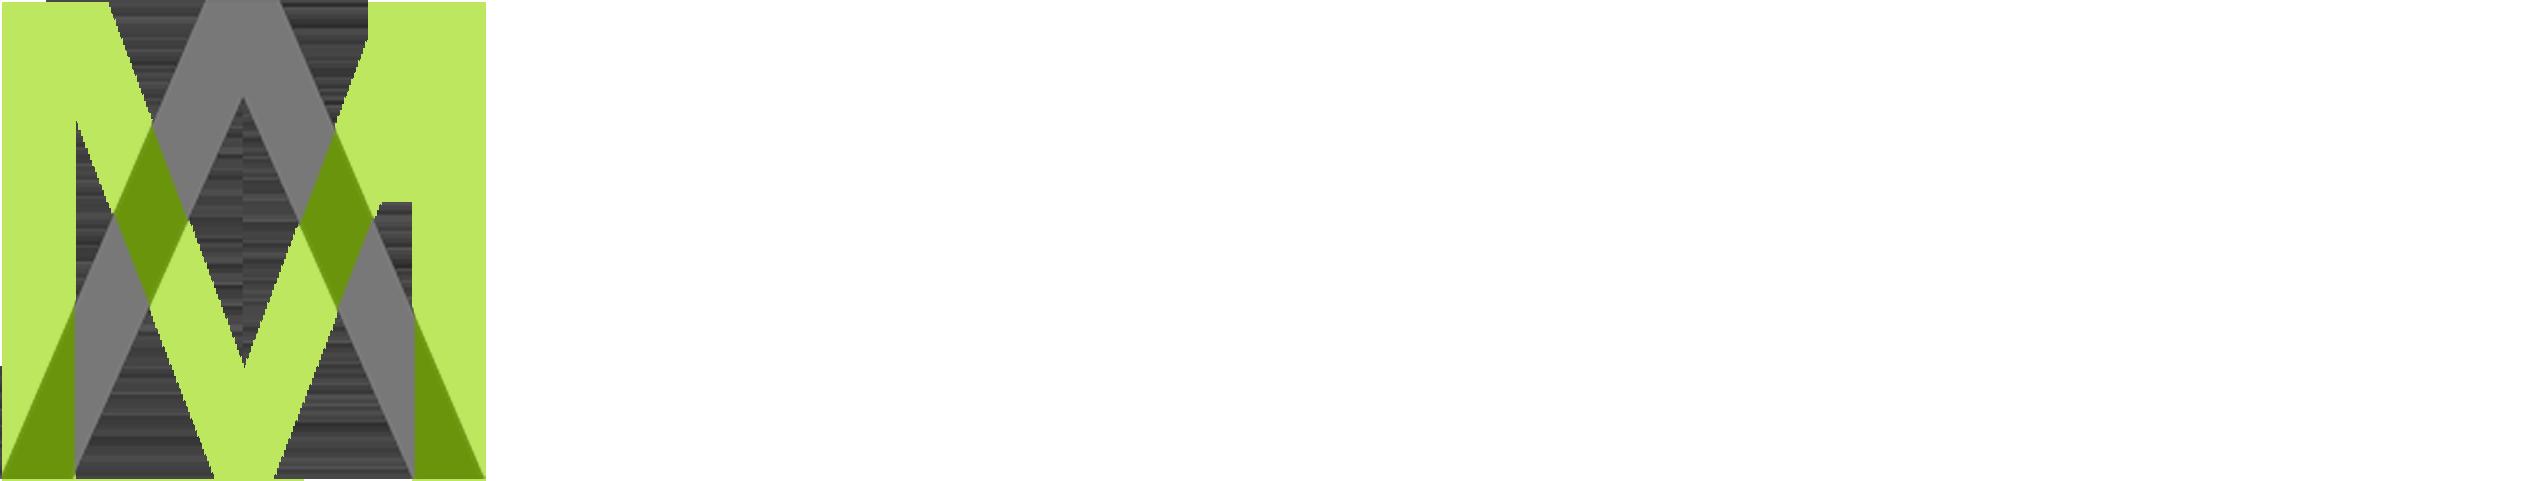 ArchiMaze - VR/AR | 3D Visualizations